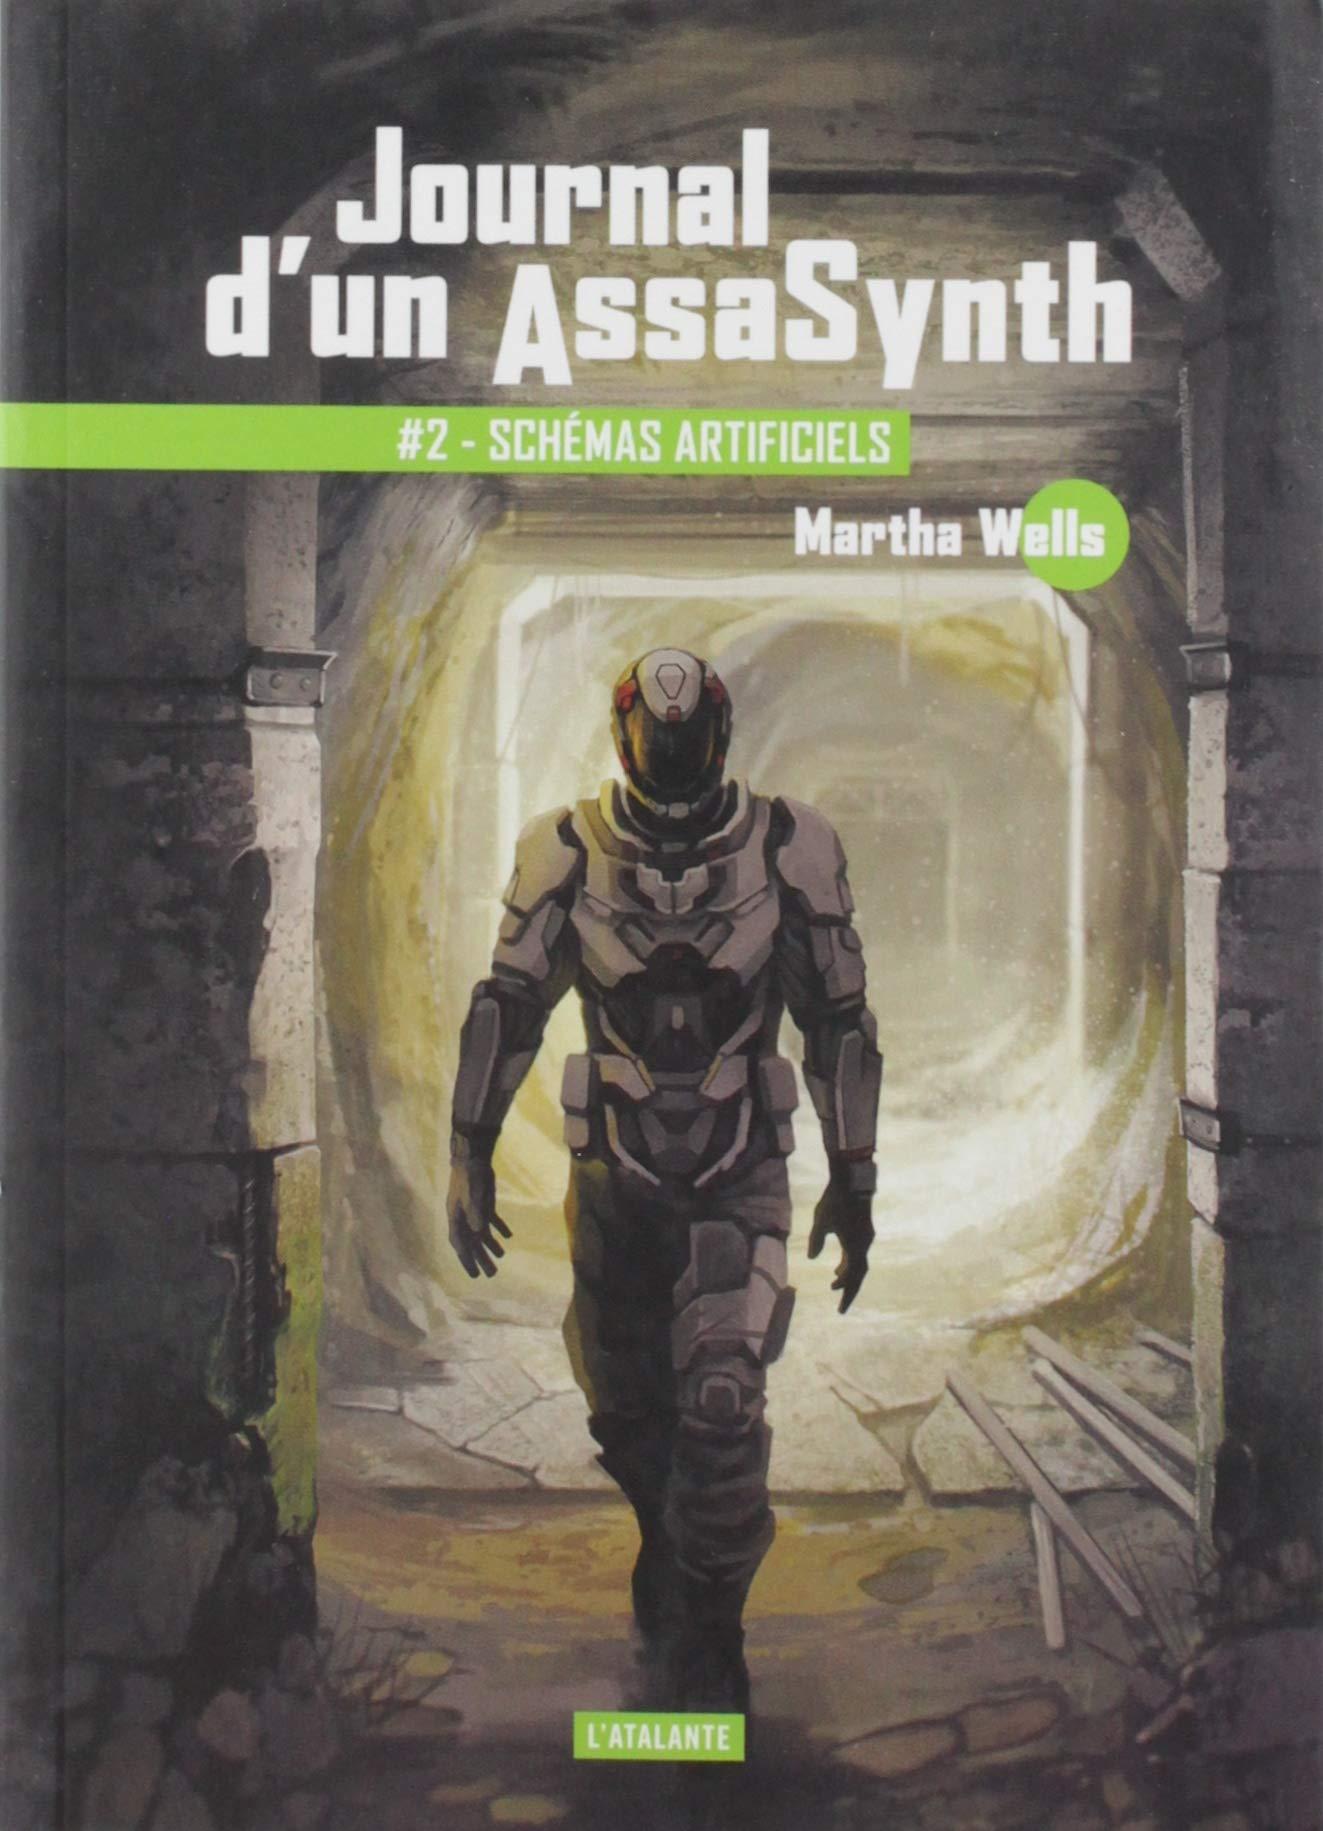 couverture de Journal d'un AssaSynth 2 : Schéma Artificiels de Martha Wells